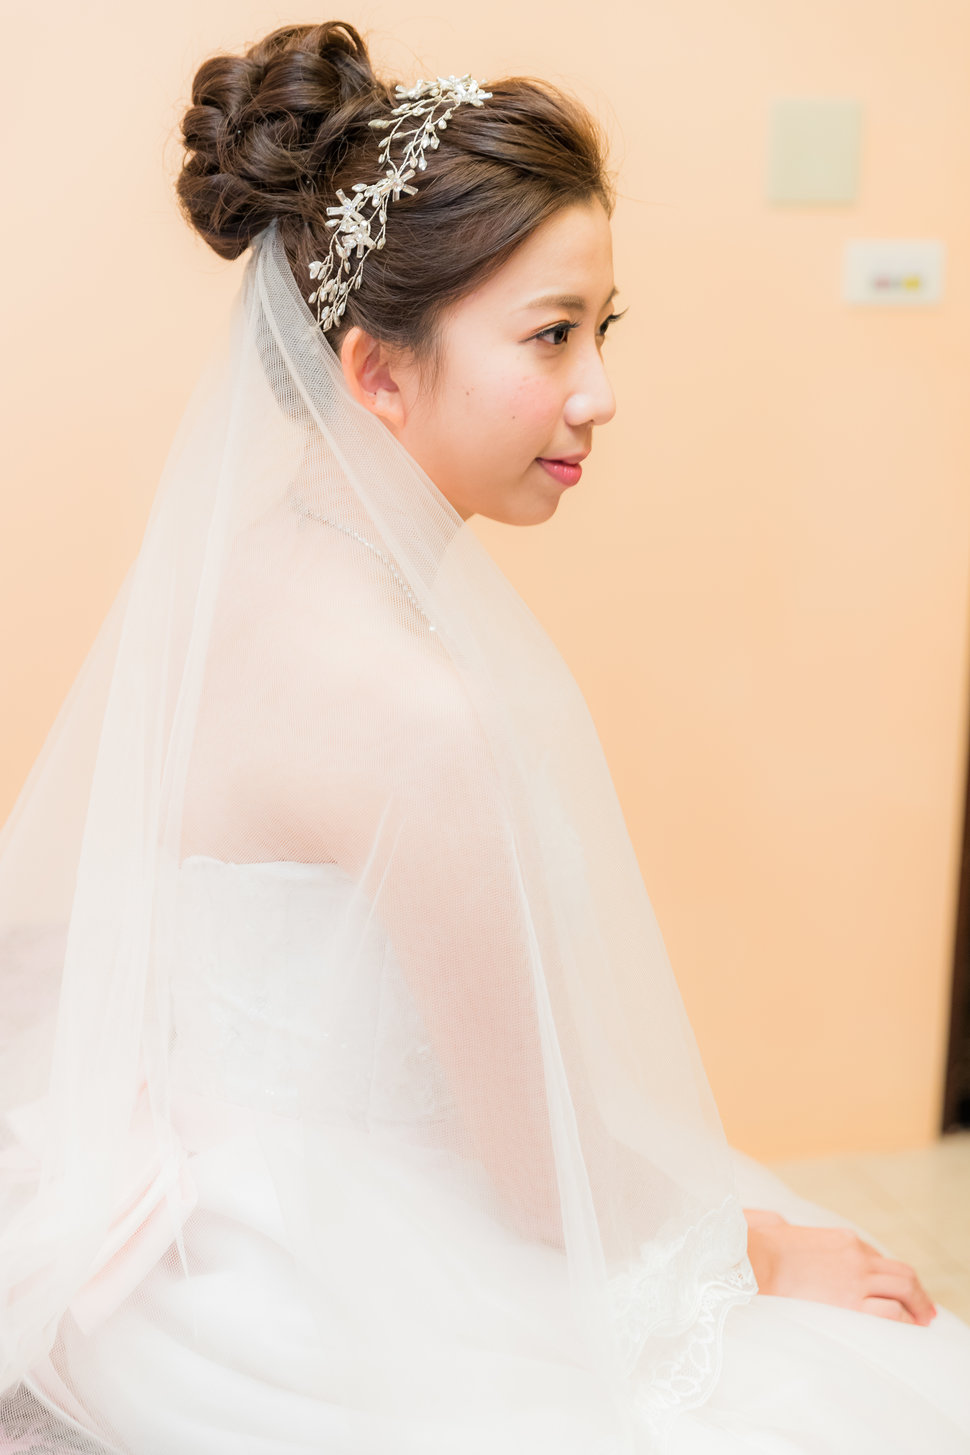 52 - Wei Photography - 結婚吧一站式婚禮服務平台